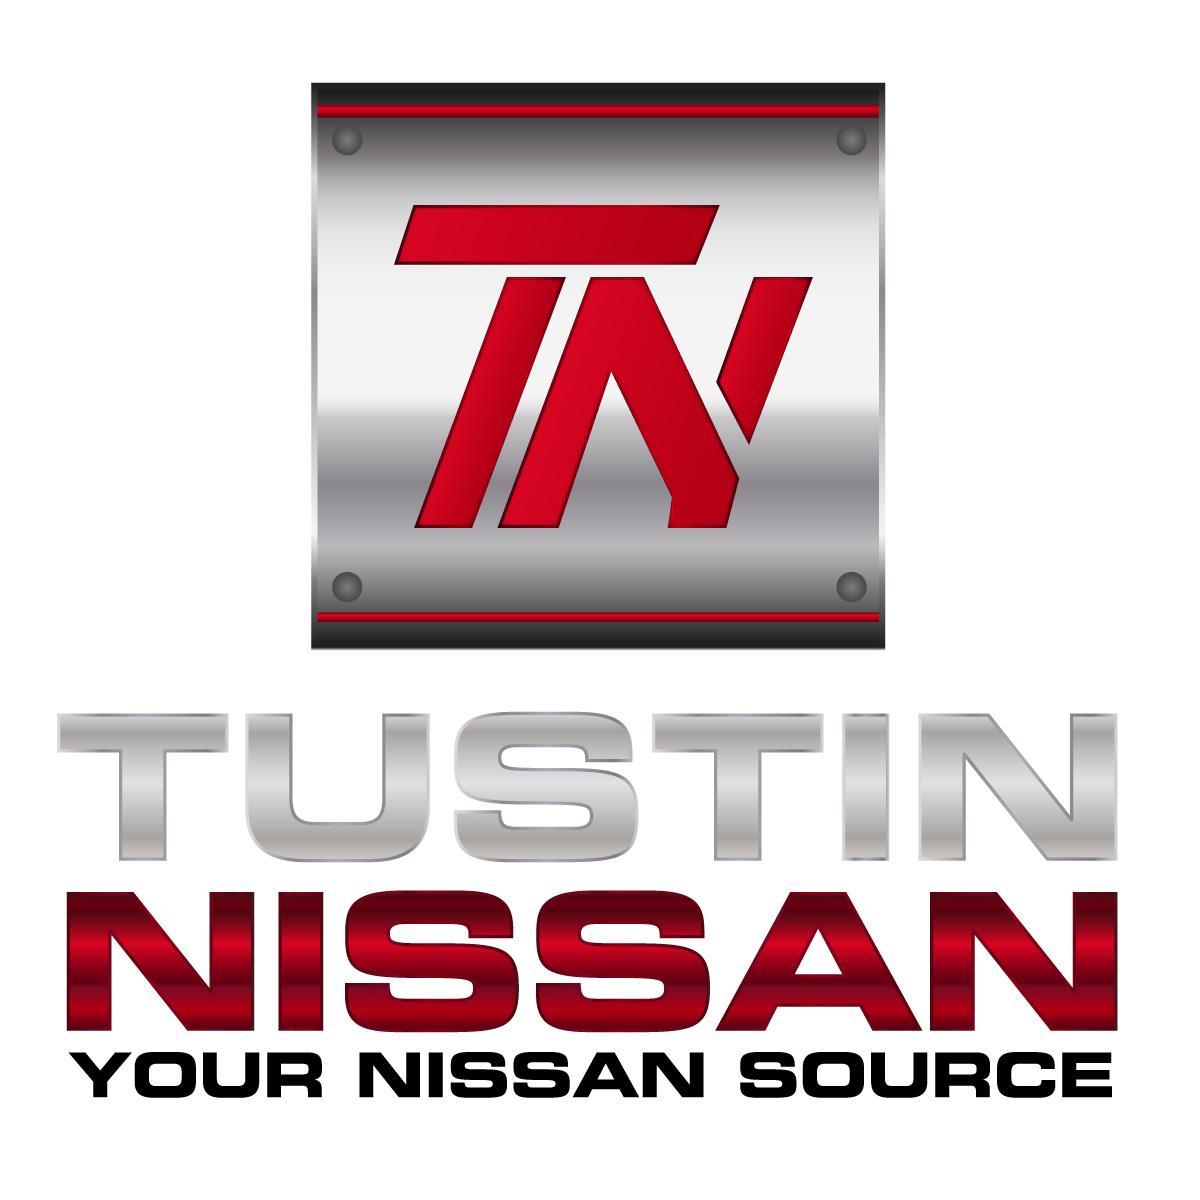 Tustin Nissan - Tustin, CA - Auto Dealers